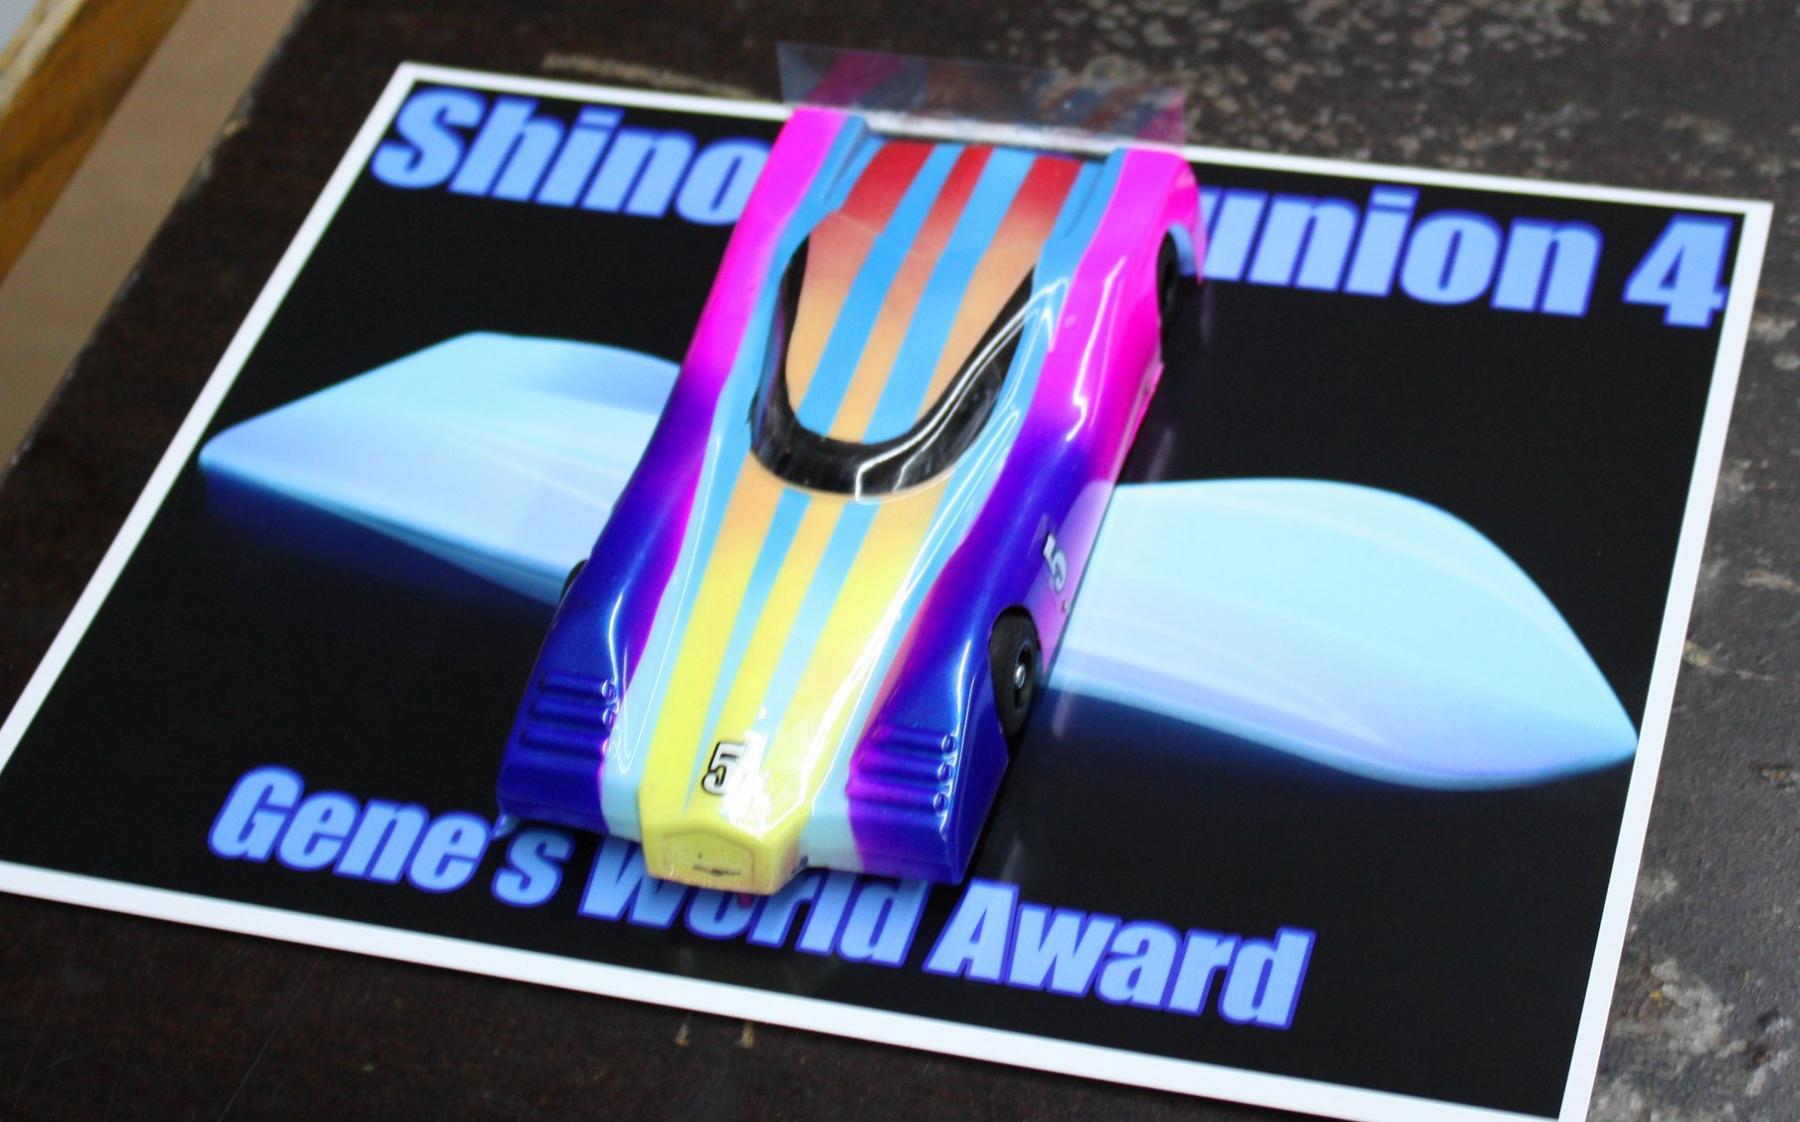 Genes World Award.jpg